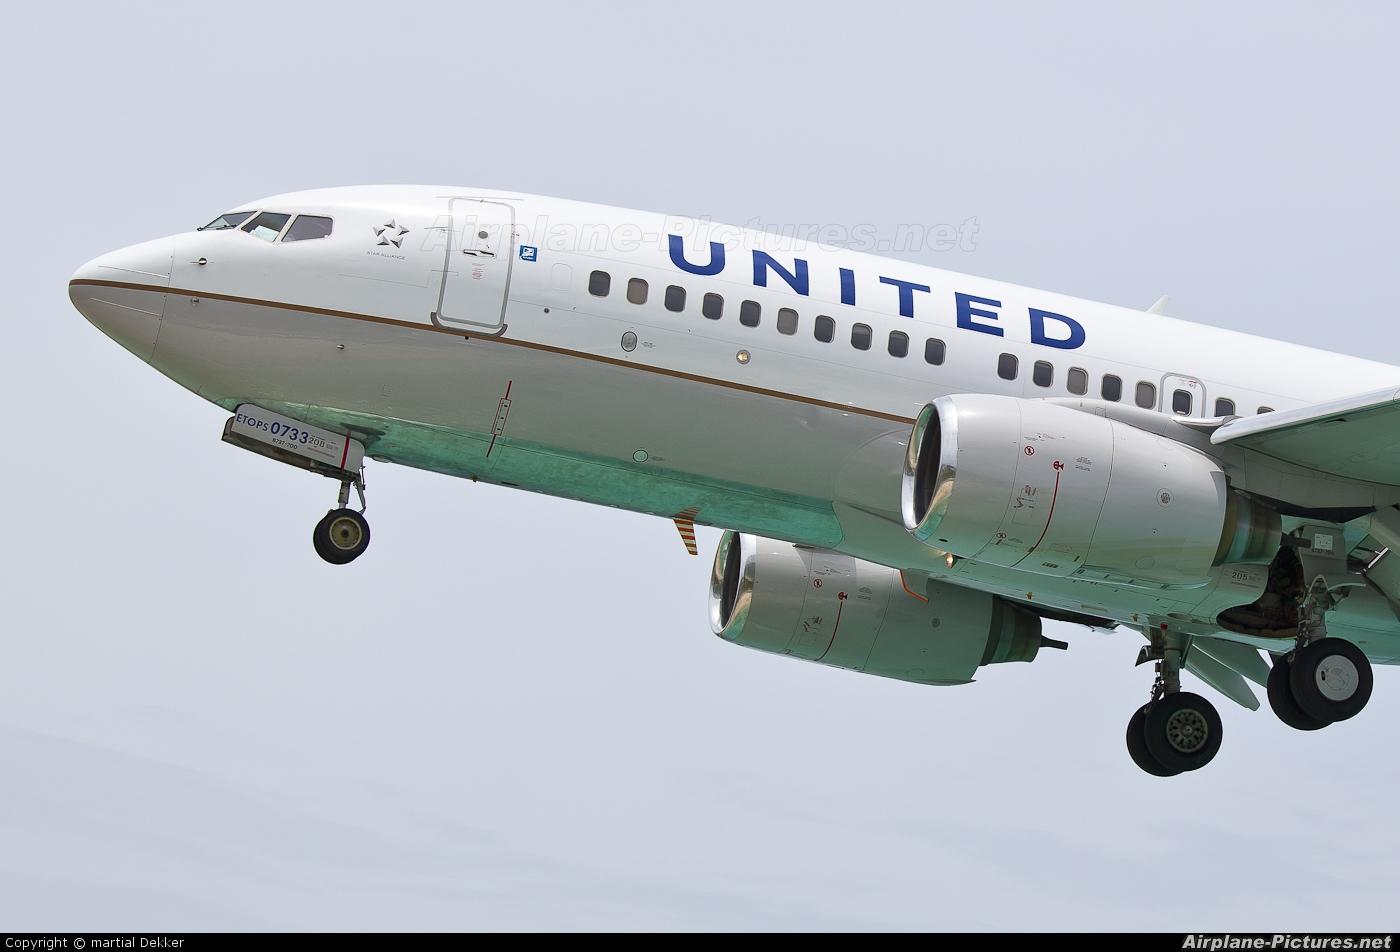 United Airlines N27733 aircraft at Sint Maarten - Princess Juliana Intl